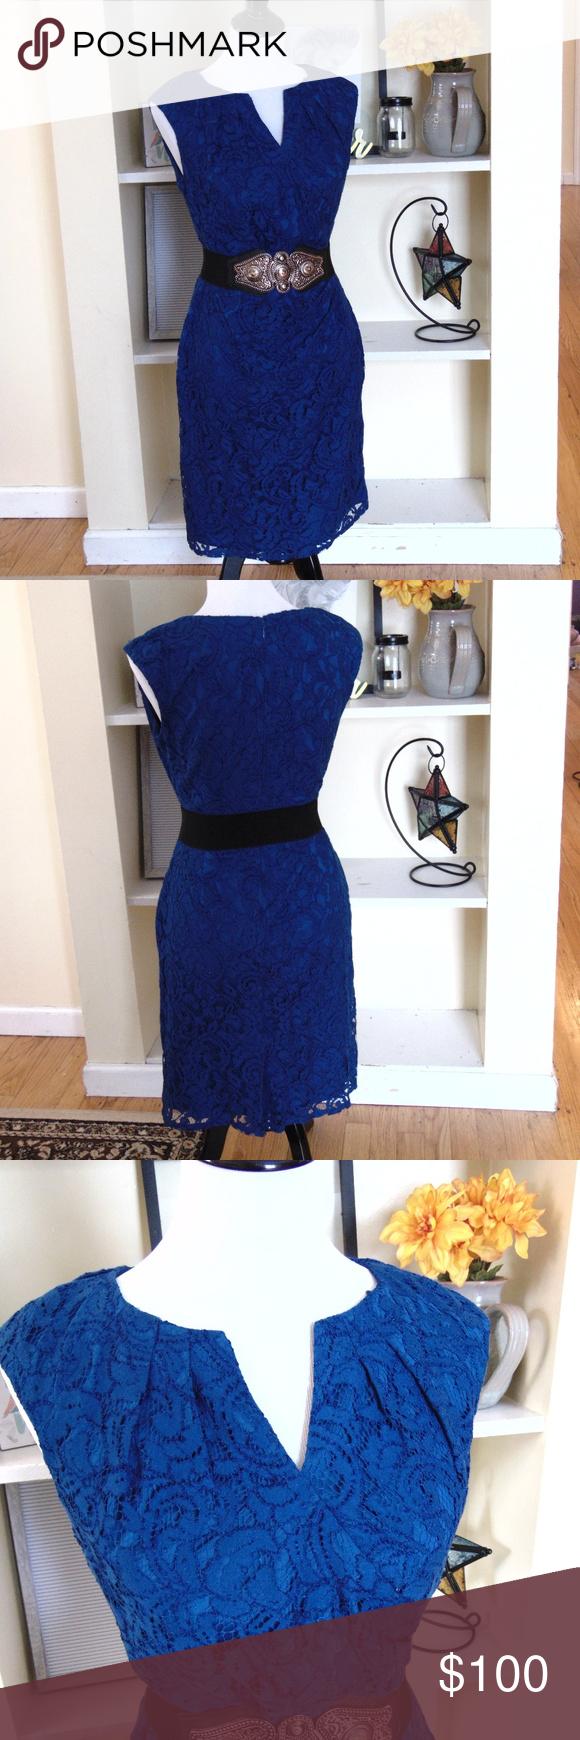 297 Adrianna Papell Knee Length Lace Sheath Dress Lace Sheath Dress Dresses Colorful Dresses